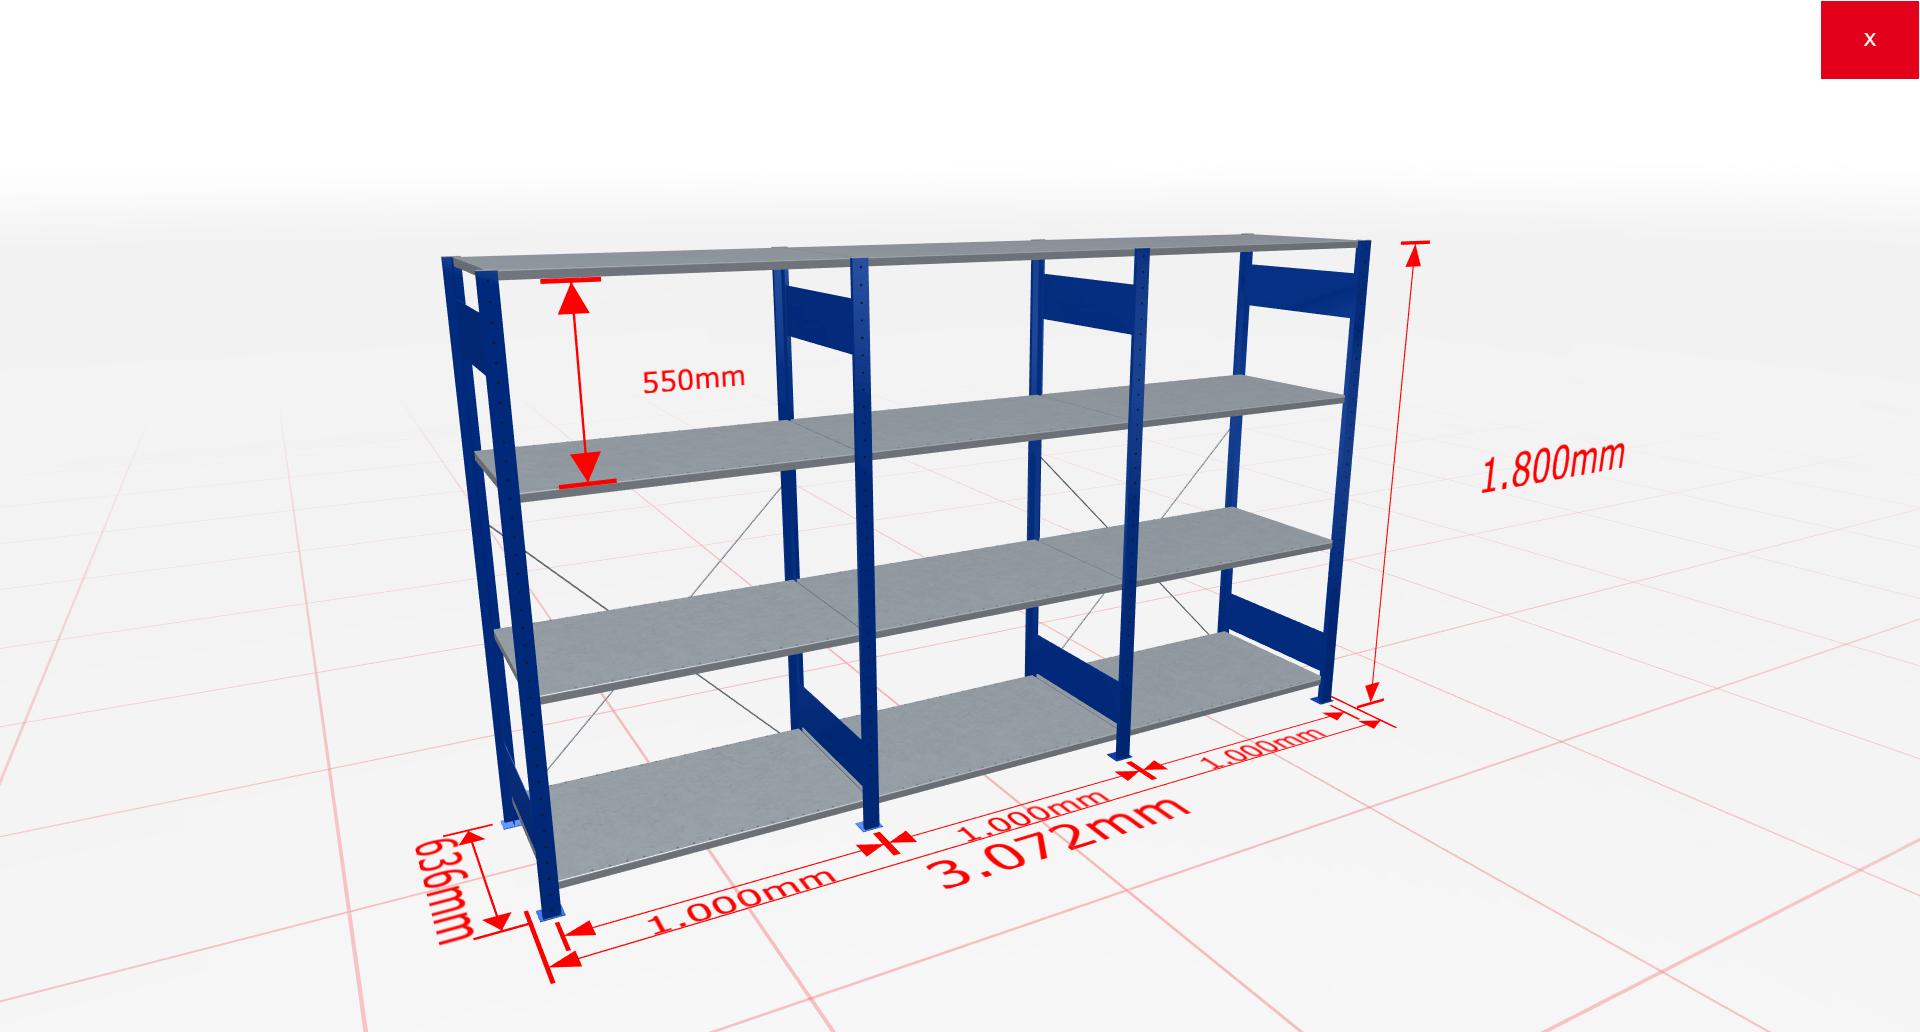 Fachbodenregal Komplettregal 1800x3072x600 mm (HxBxT) SCHULTE Lagertechnik blau 4 Ebenen  150 kg je Boden